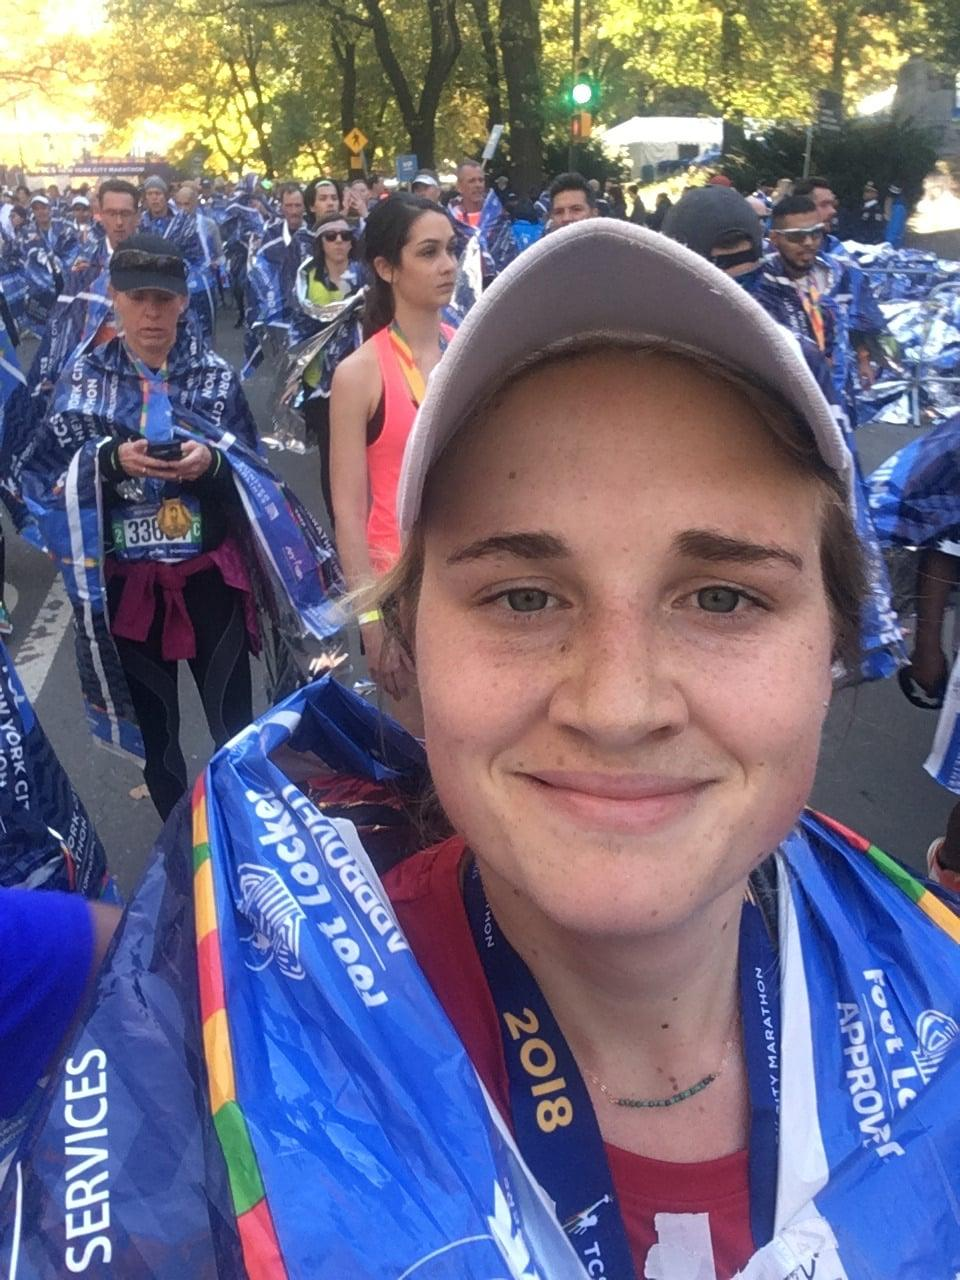 Kirsten New York Marathon Finish Face